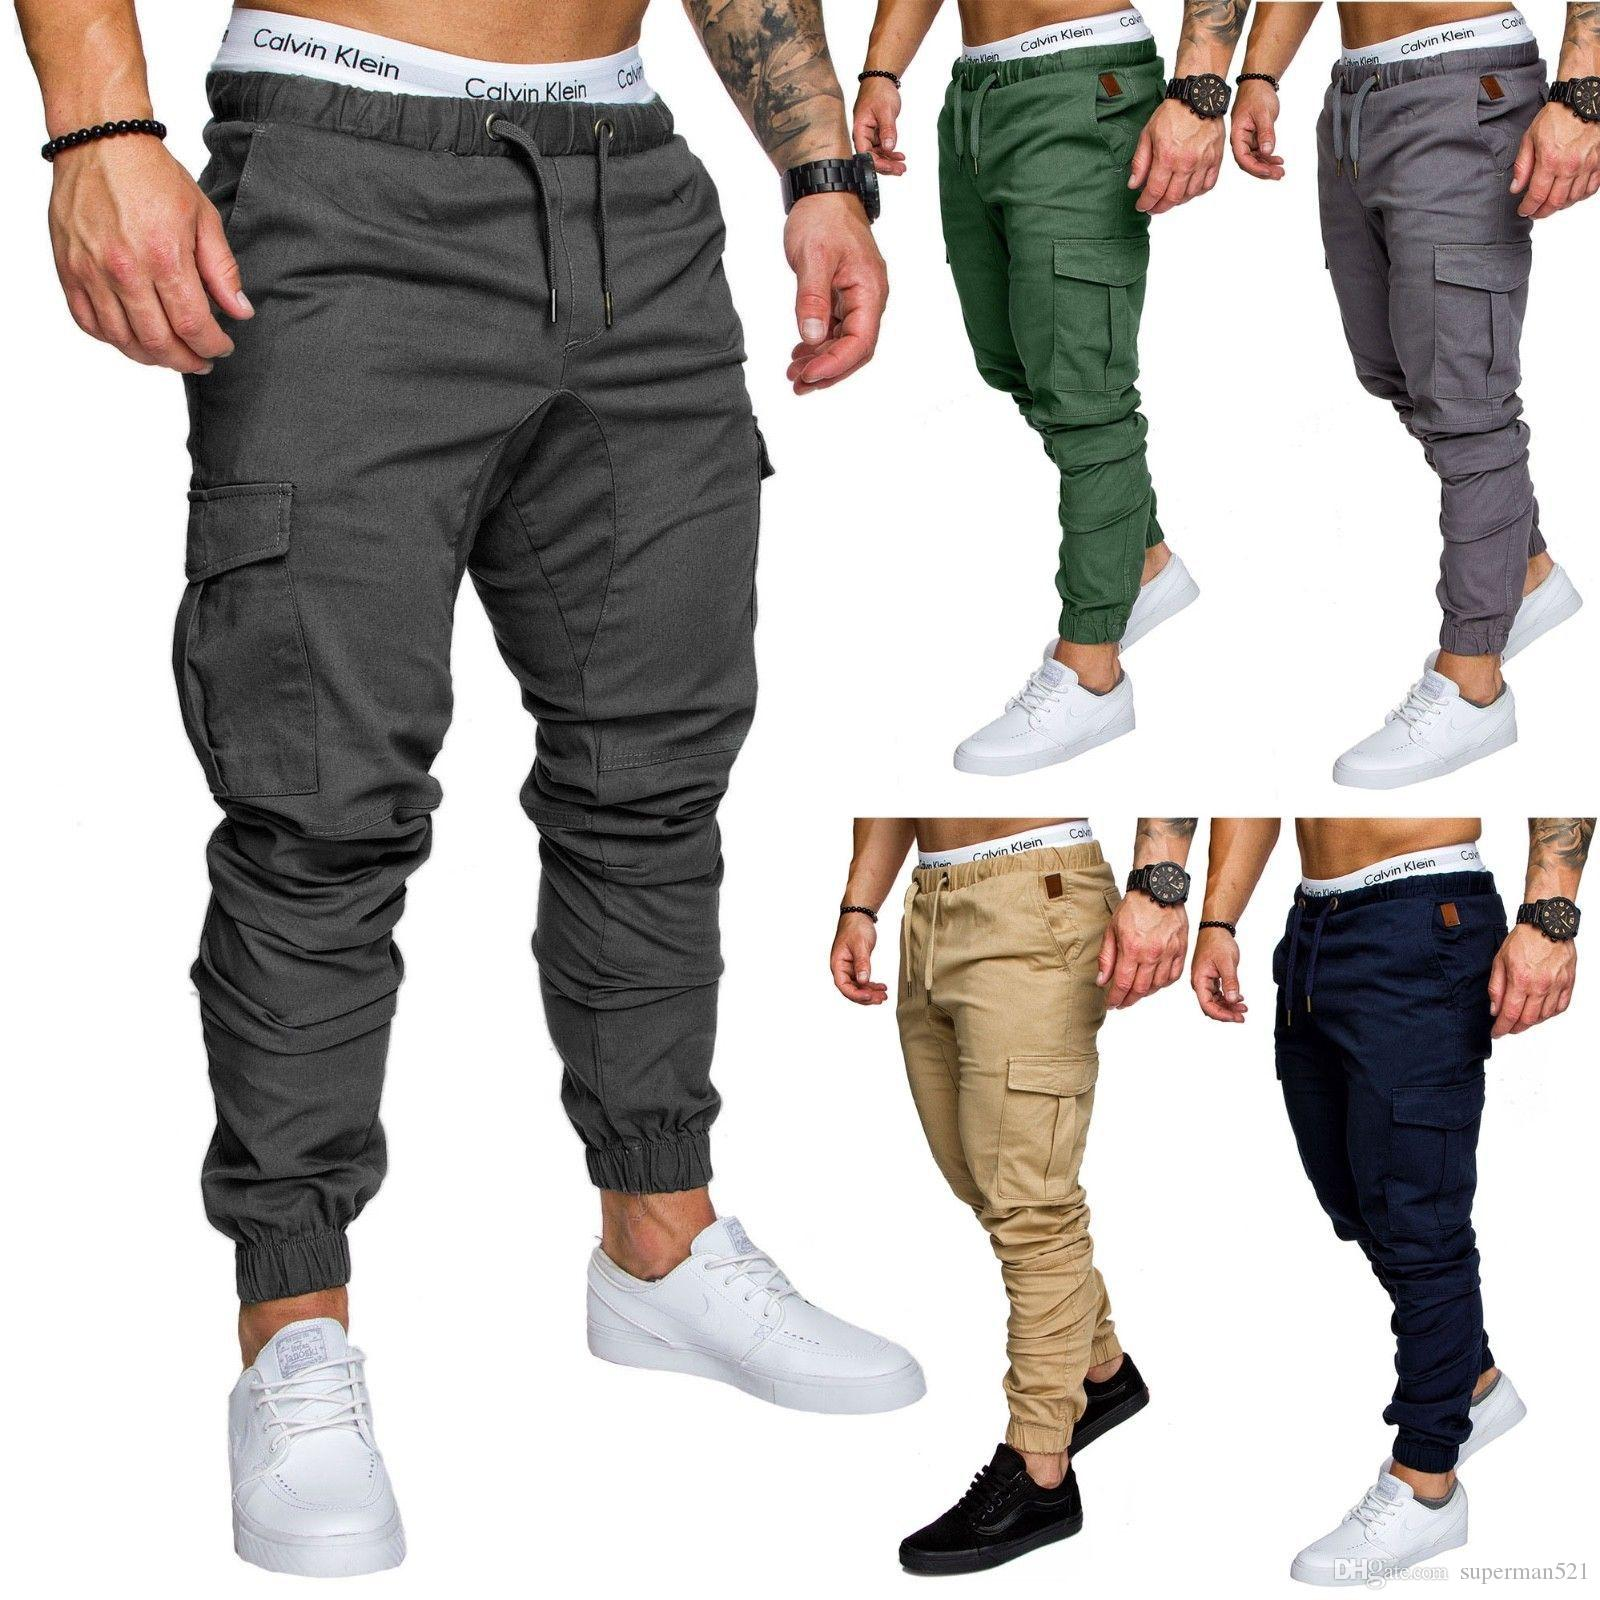 7ba6bed7 2019 Designer Mens Clothing Cargo Pants Pocket Safari Style Casual Elastic  Waist Hip Hop Sweatpants Joggers New 2018 Streetwear Trousers From  Superman521, ...